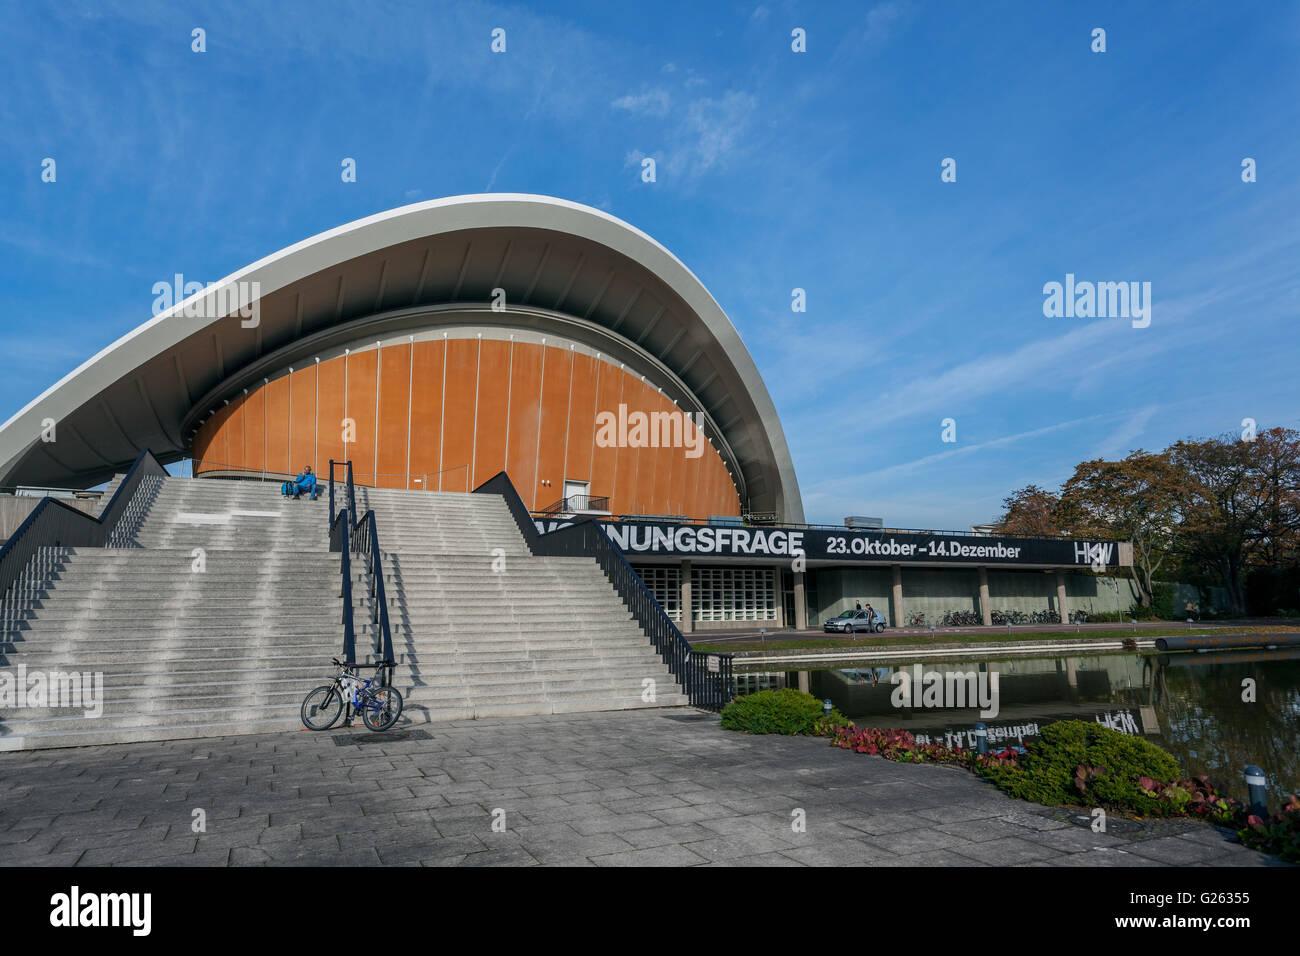 Haus der Kulturen der Welt, House of the World's Cultures, Großer Tiergarten, architect Hugh Stubbins, - Stock Image